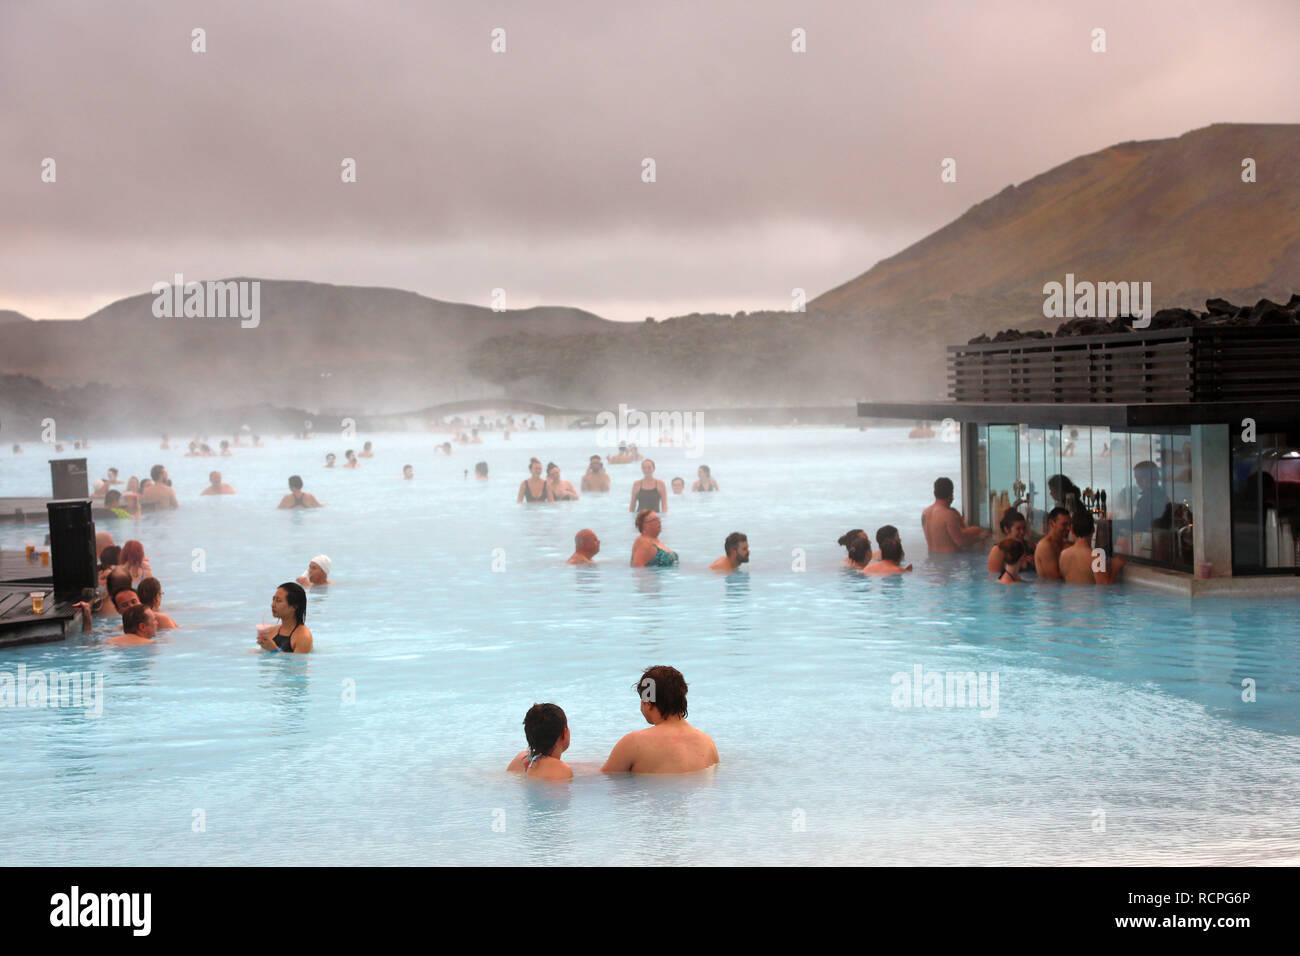 People bathing in the Blue Lagoon geothermal spa, Grindavik, Iceland - Stock Image